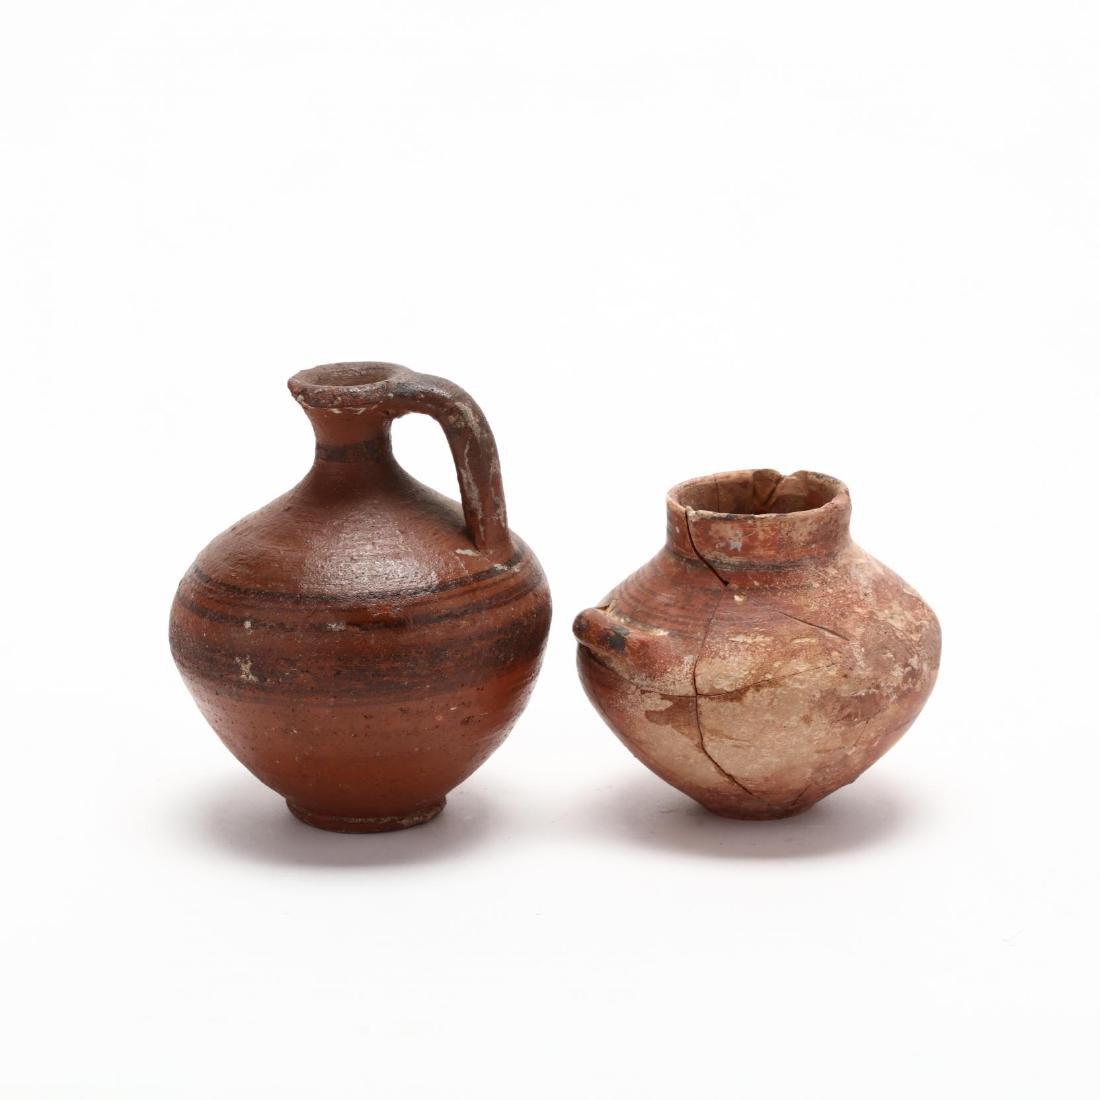 Two Cypro-Geometric Red Ware Jars - 3